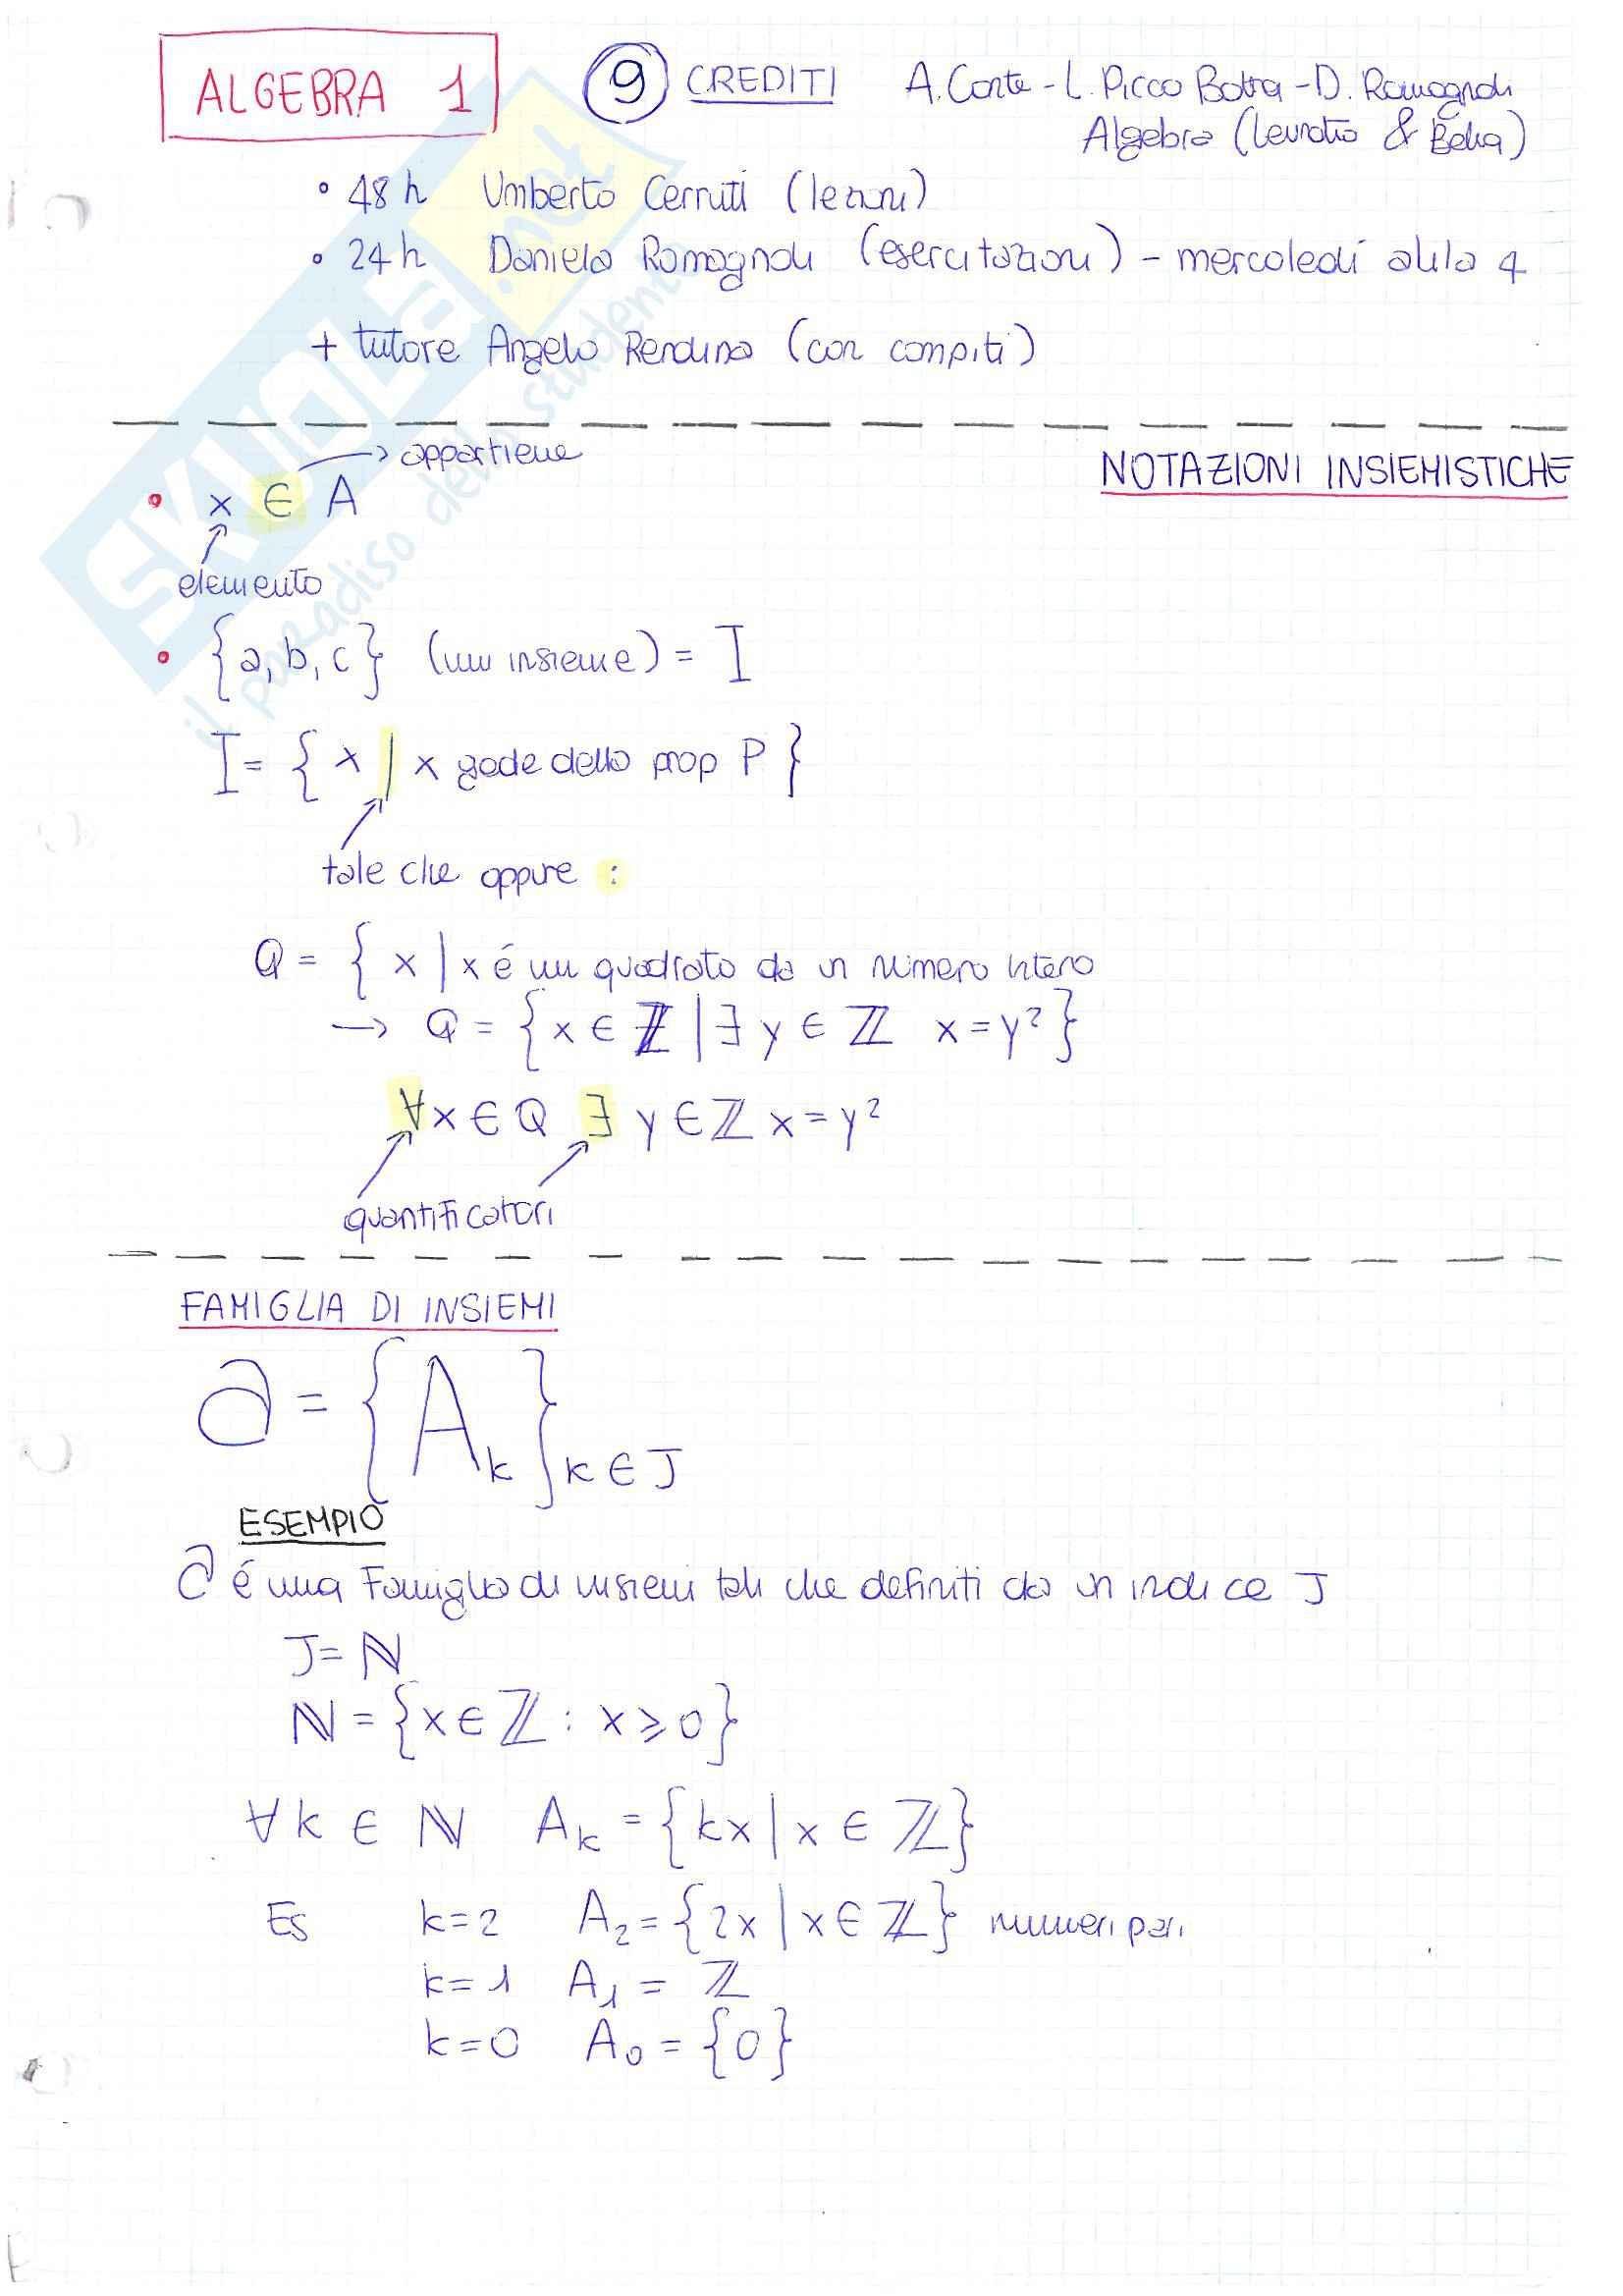 Lezioni ed esercitazioni, Algebra 1